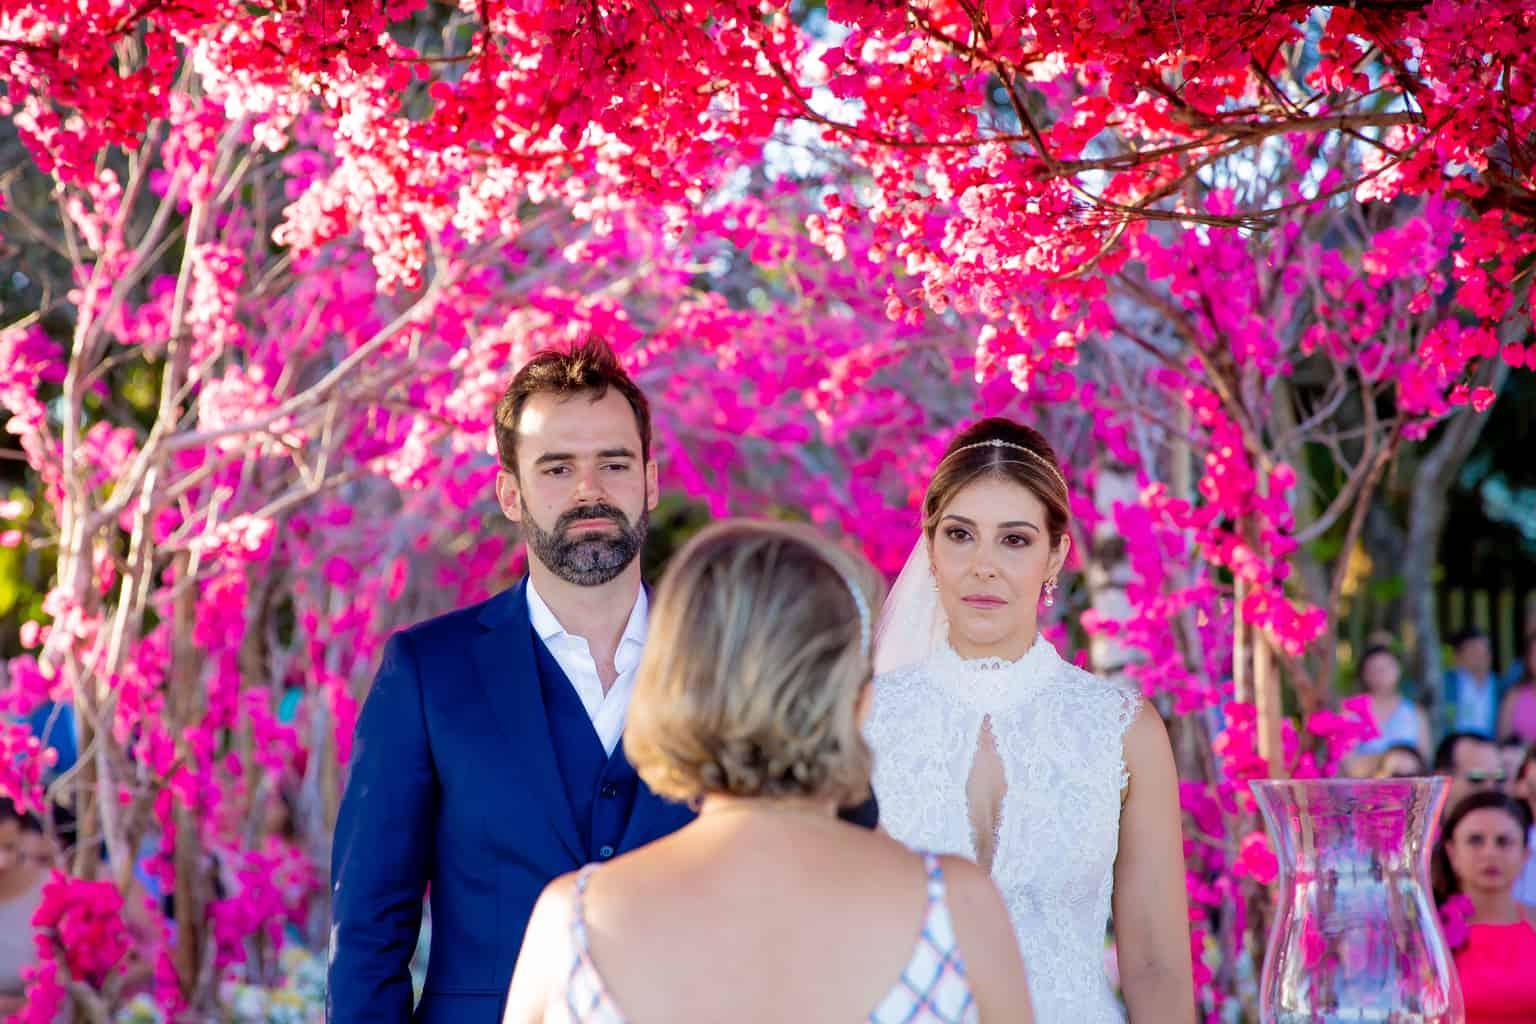 casamento-Taina-e-Hugo-Itapororoca-Villa-Trancoso-Patricia-Galvao-Sotter-Fotografia-Cerimonia-na-praia618